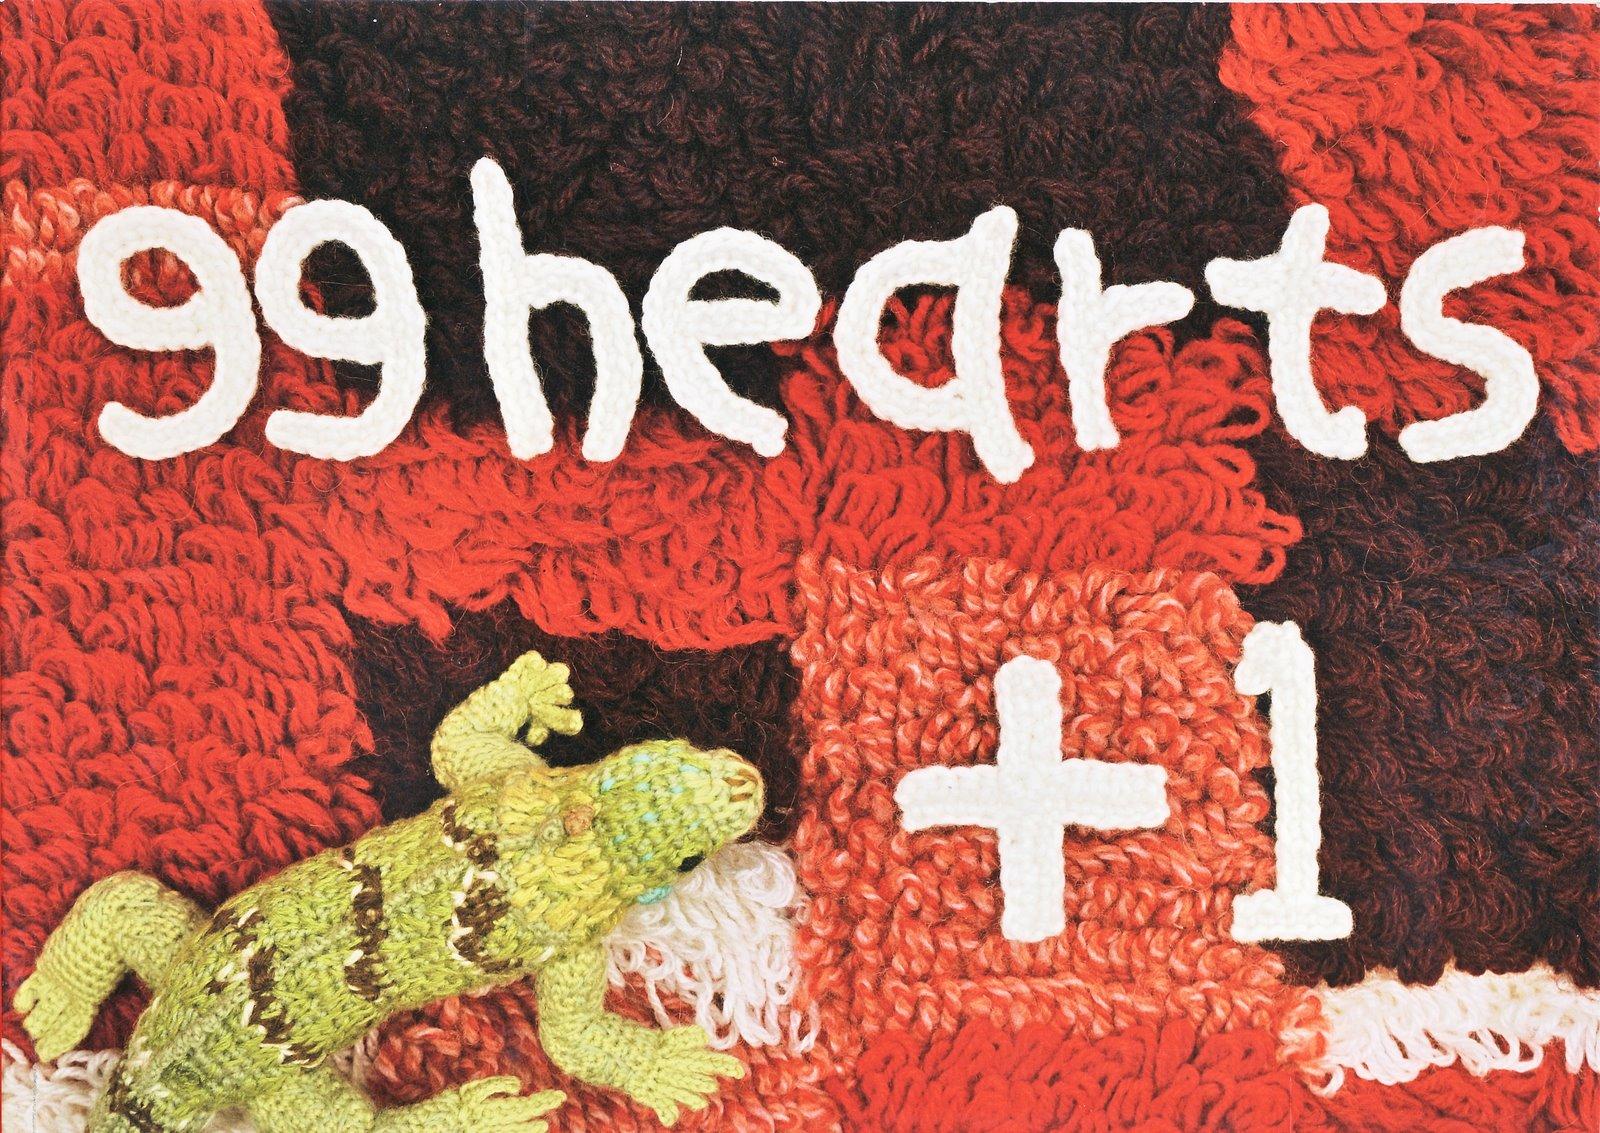 99heartsplus1